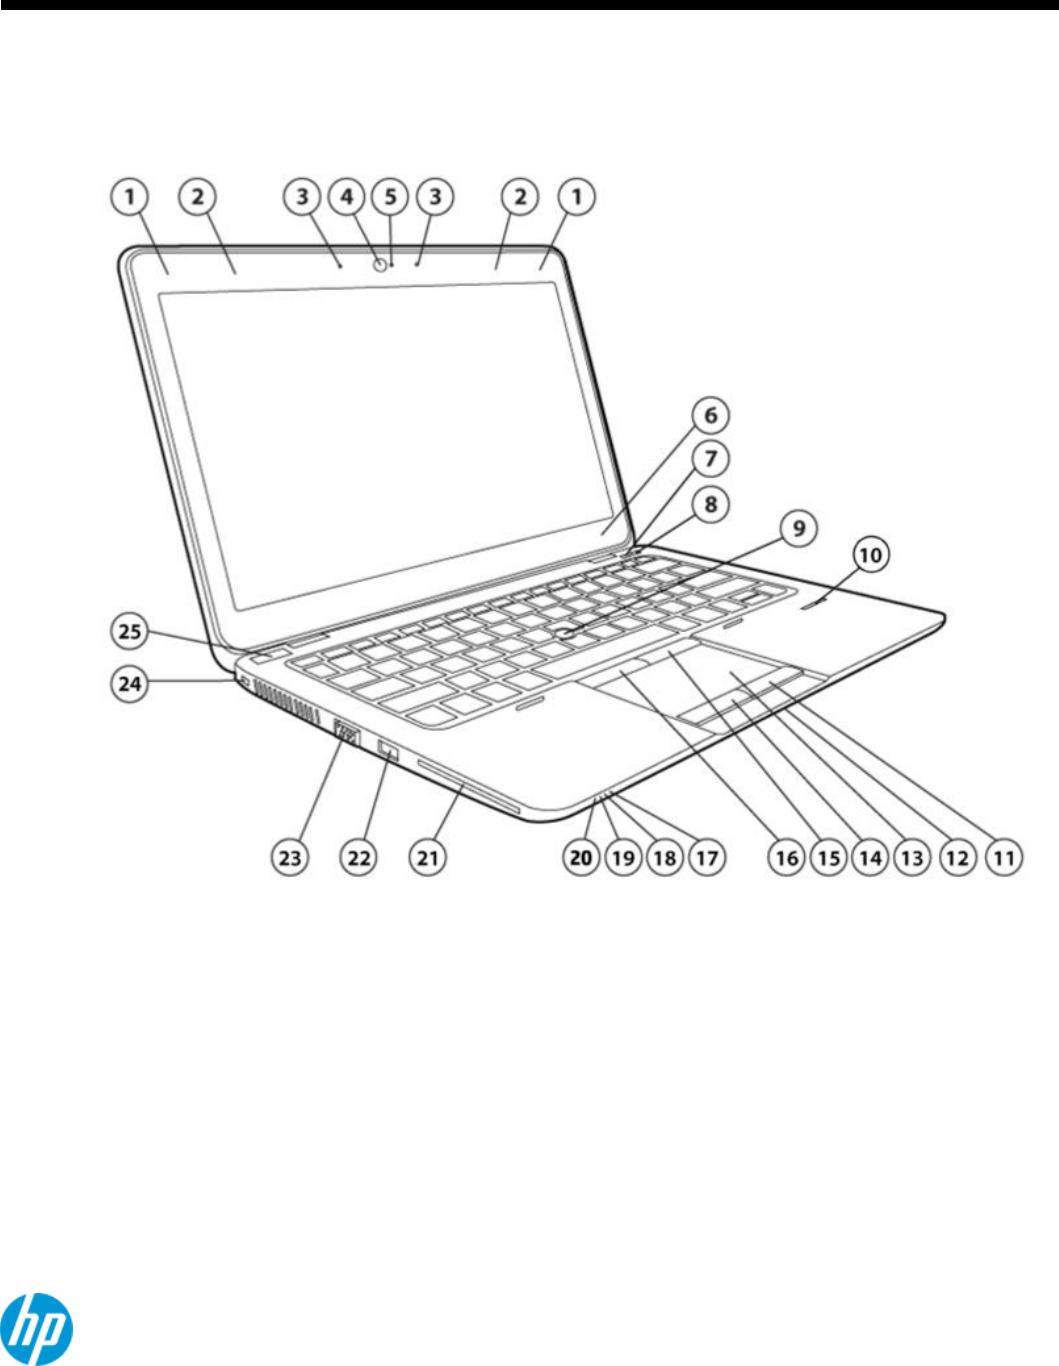 QuickSpecs HP EliteBook 850 G2 Notebook PC